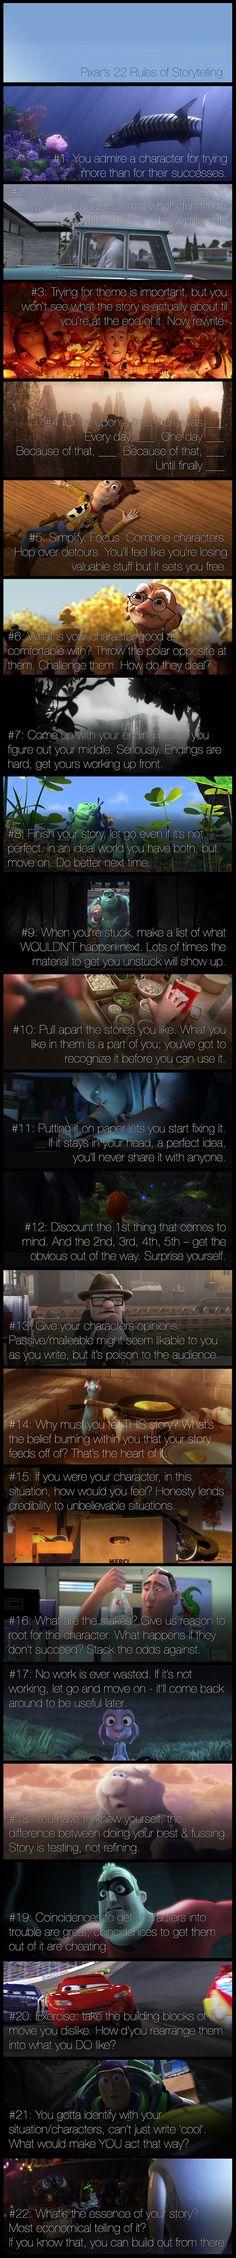 Dino Ignacio Pixar 22 Rules For Screenplay Writing Emma Coats